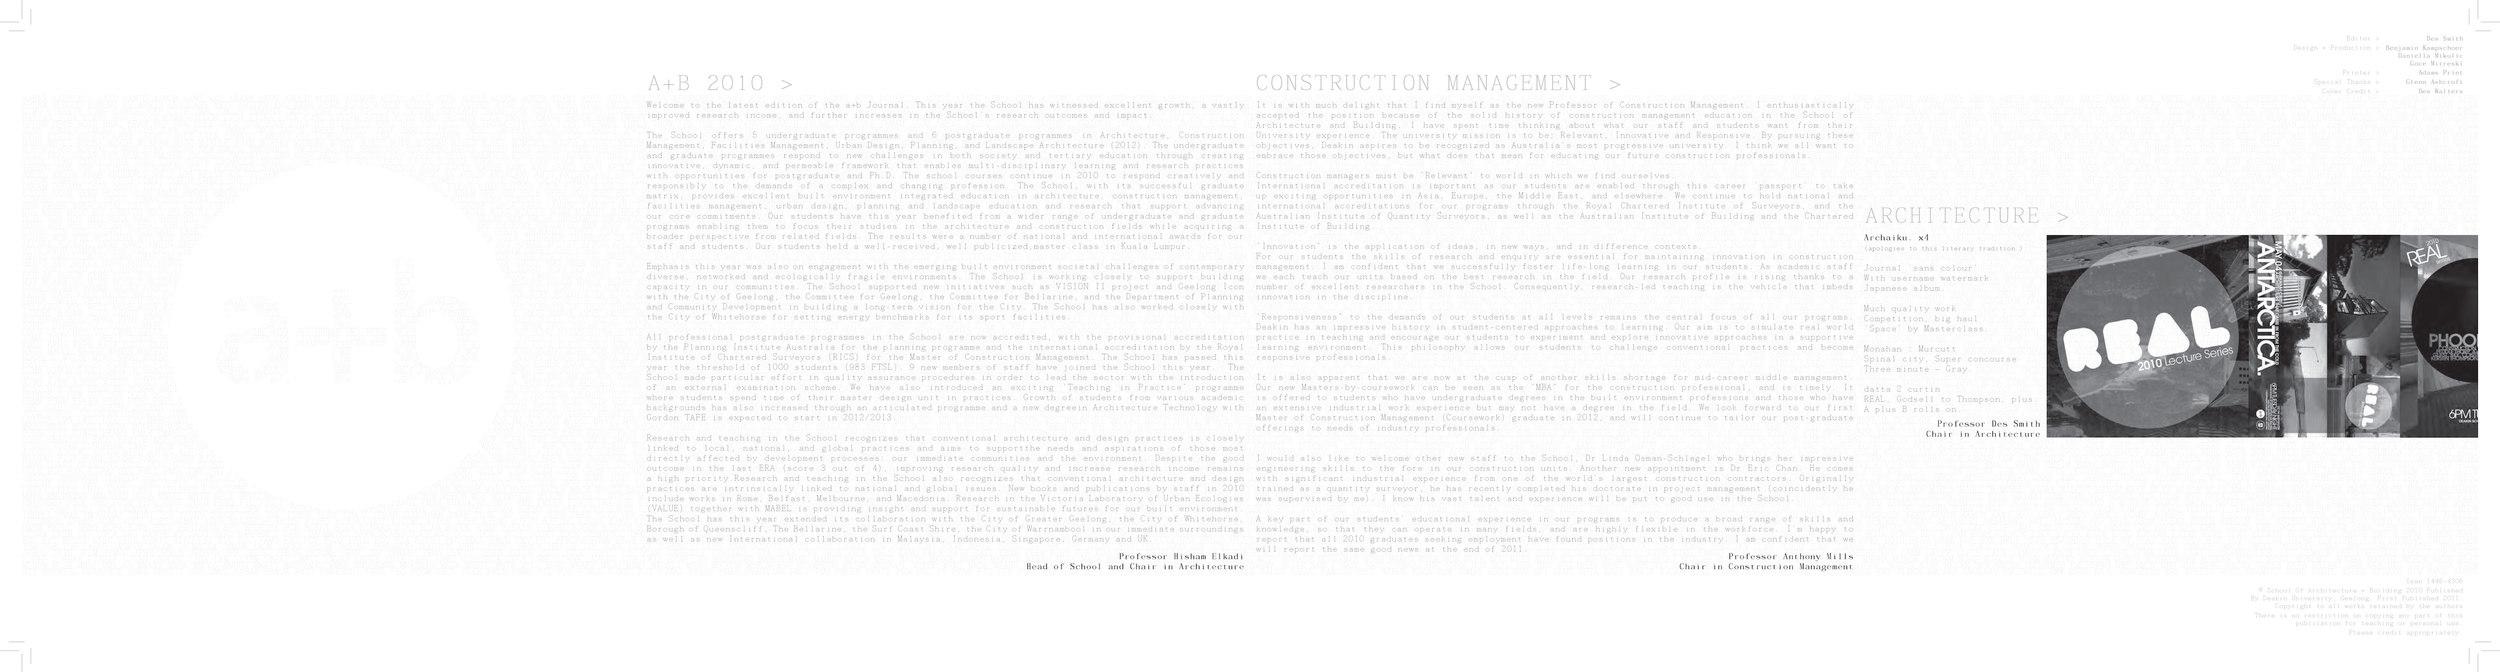 a+bJournal2010-web_Page_06.jpg